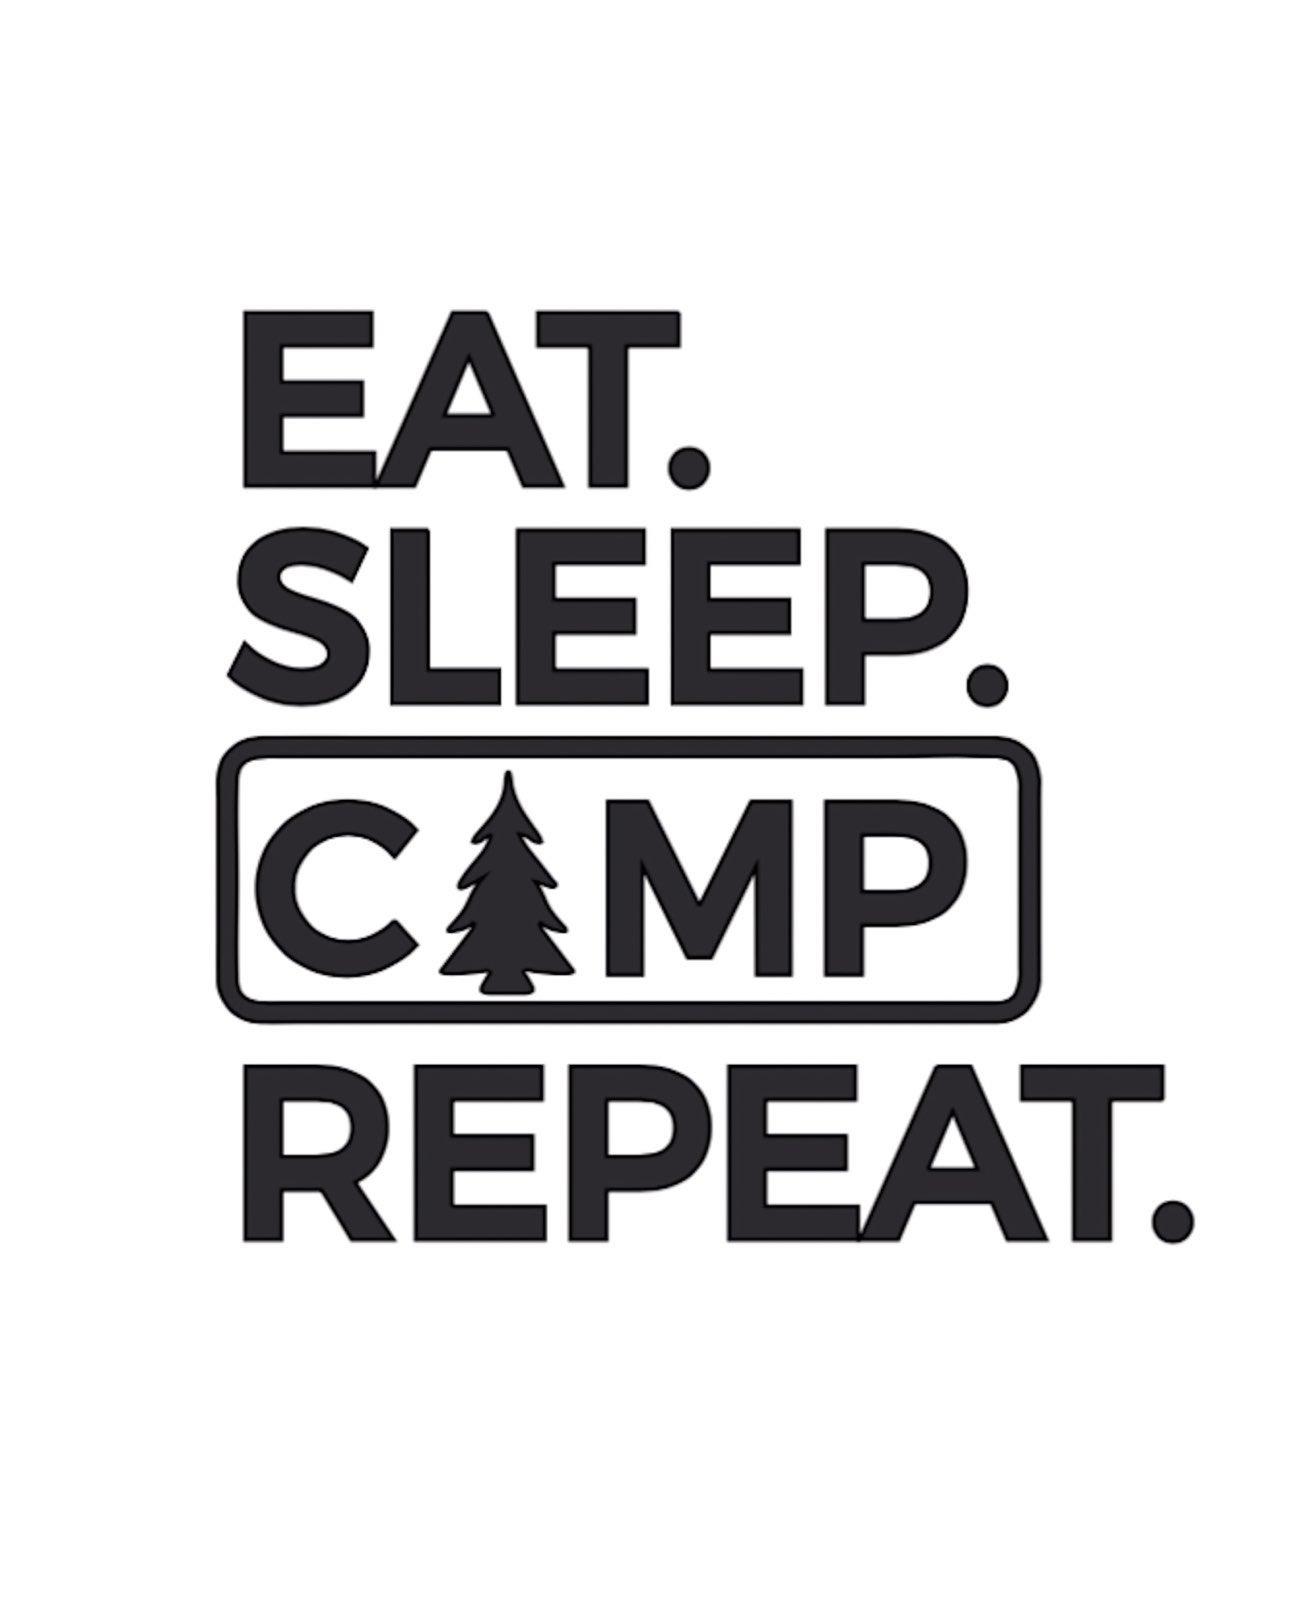 Eat sleep camp repeat Decal